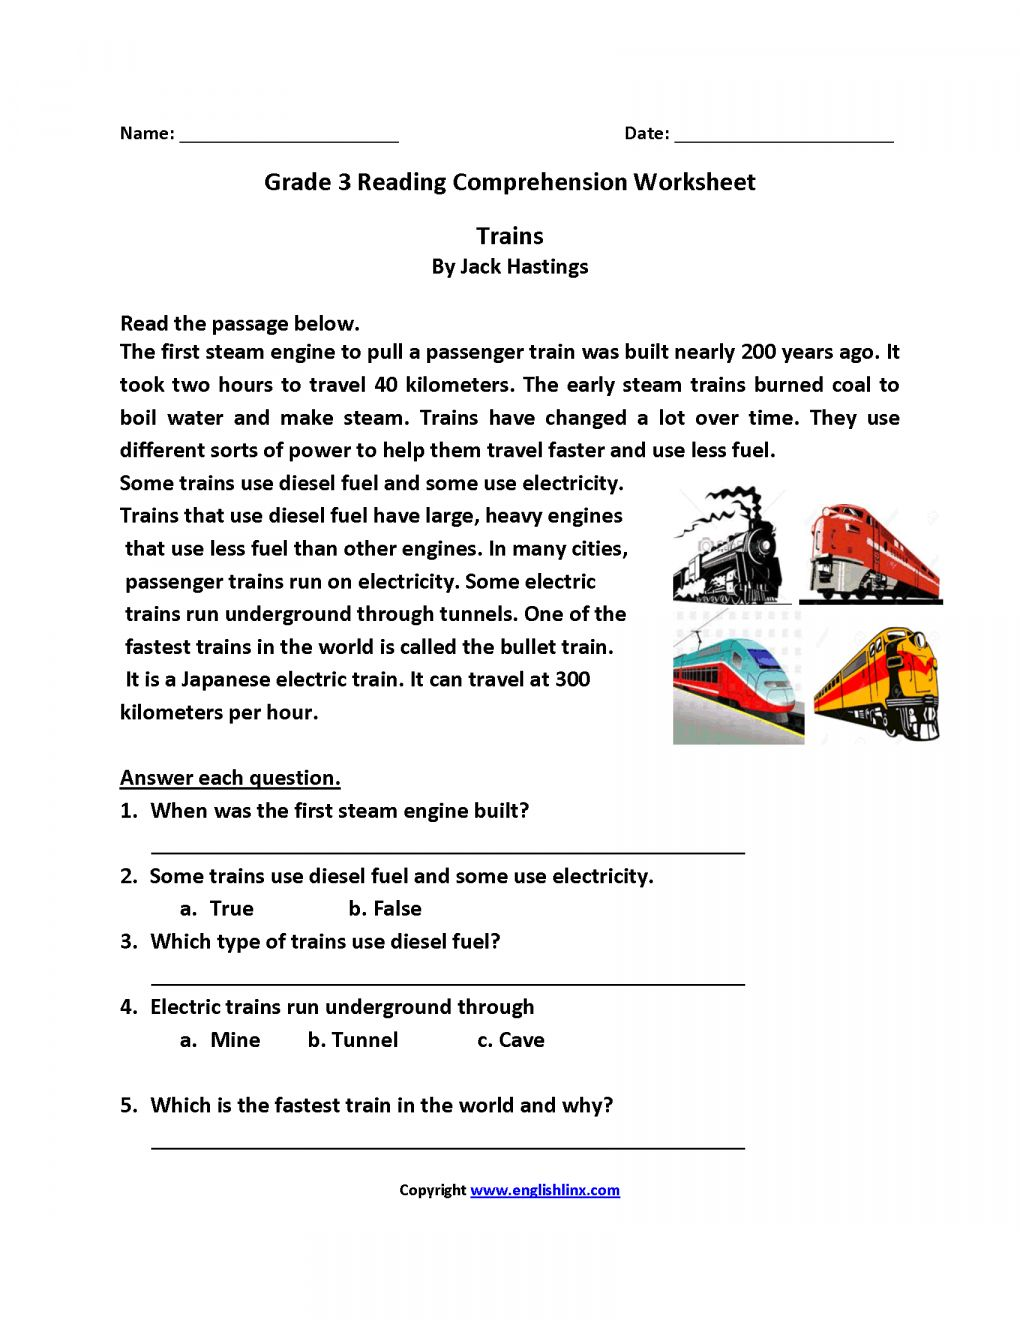 16+ Reading Worksheets For 3Rd Grade - Chart-sheet.com   Reading  comprehension worksheets [ 1320 x 1020 Pixel ]